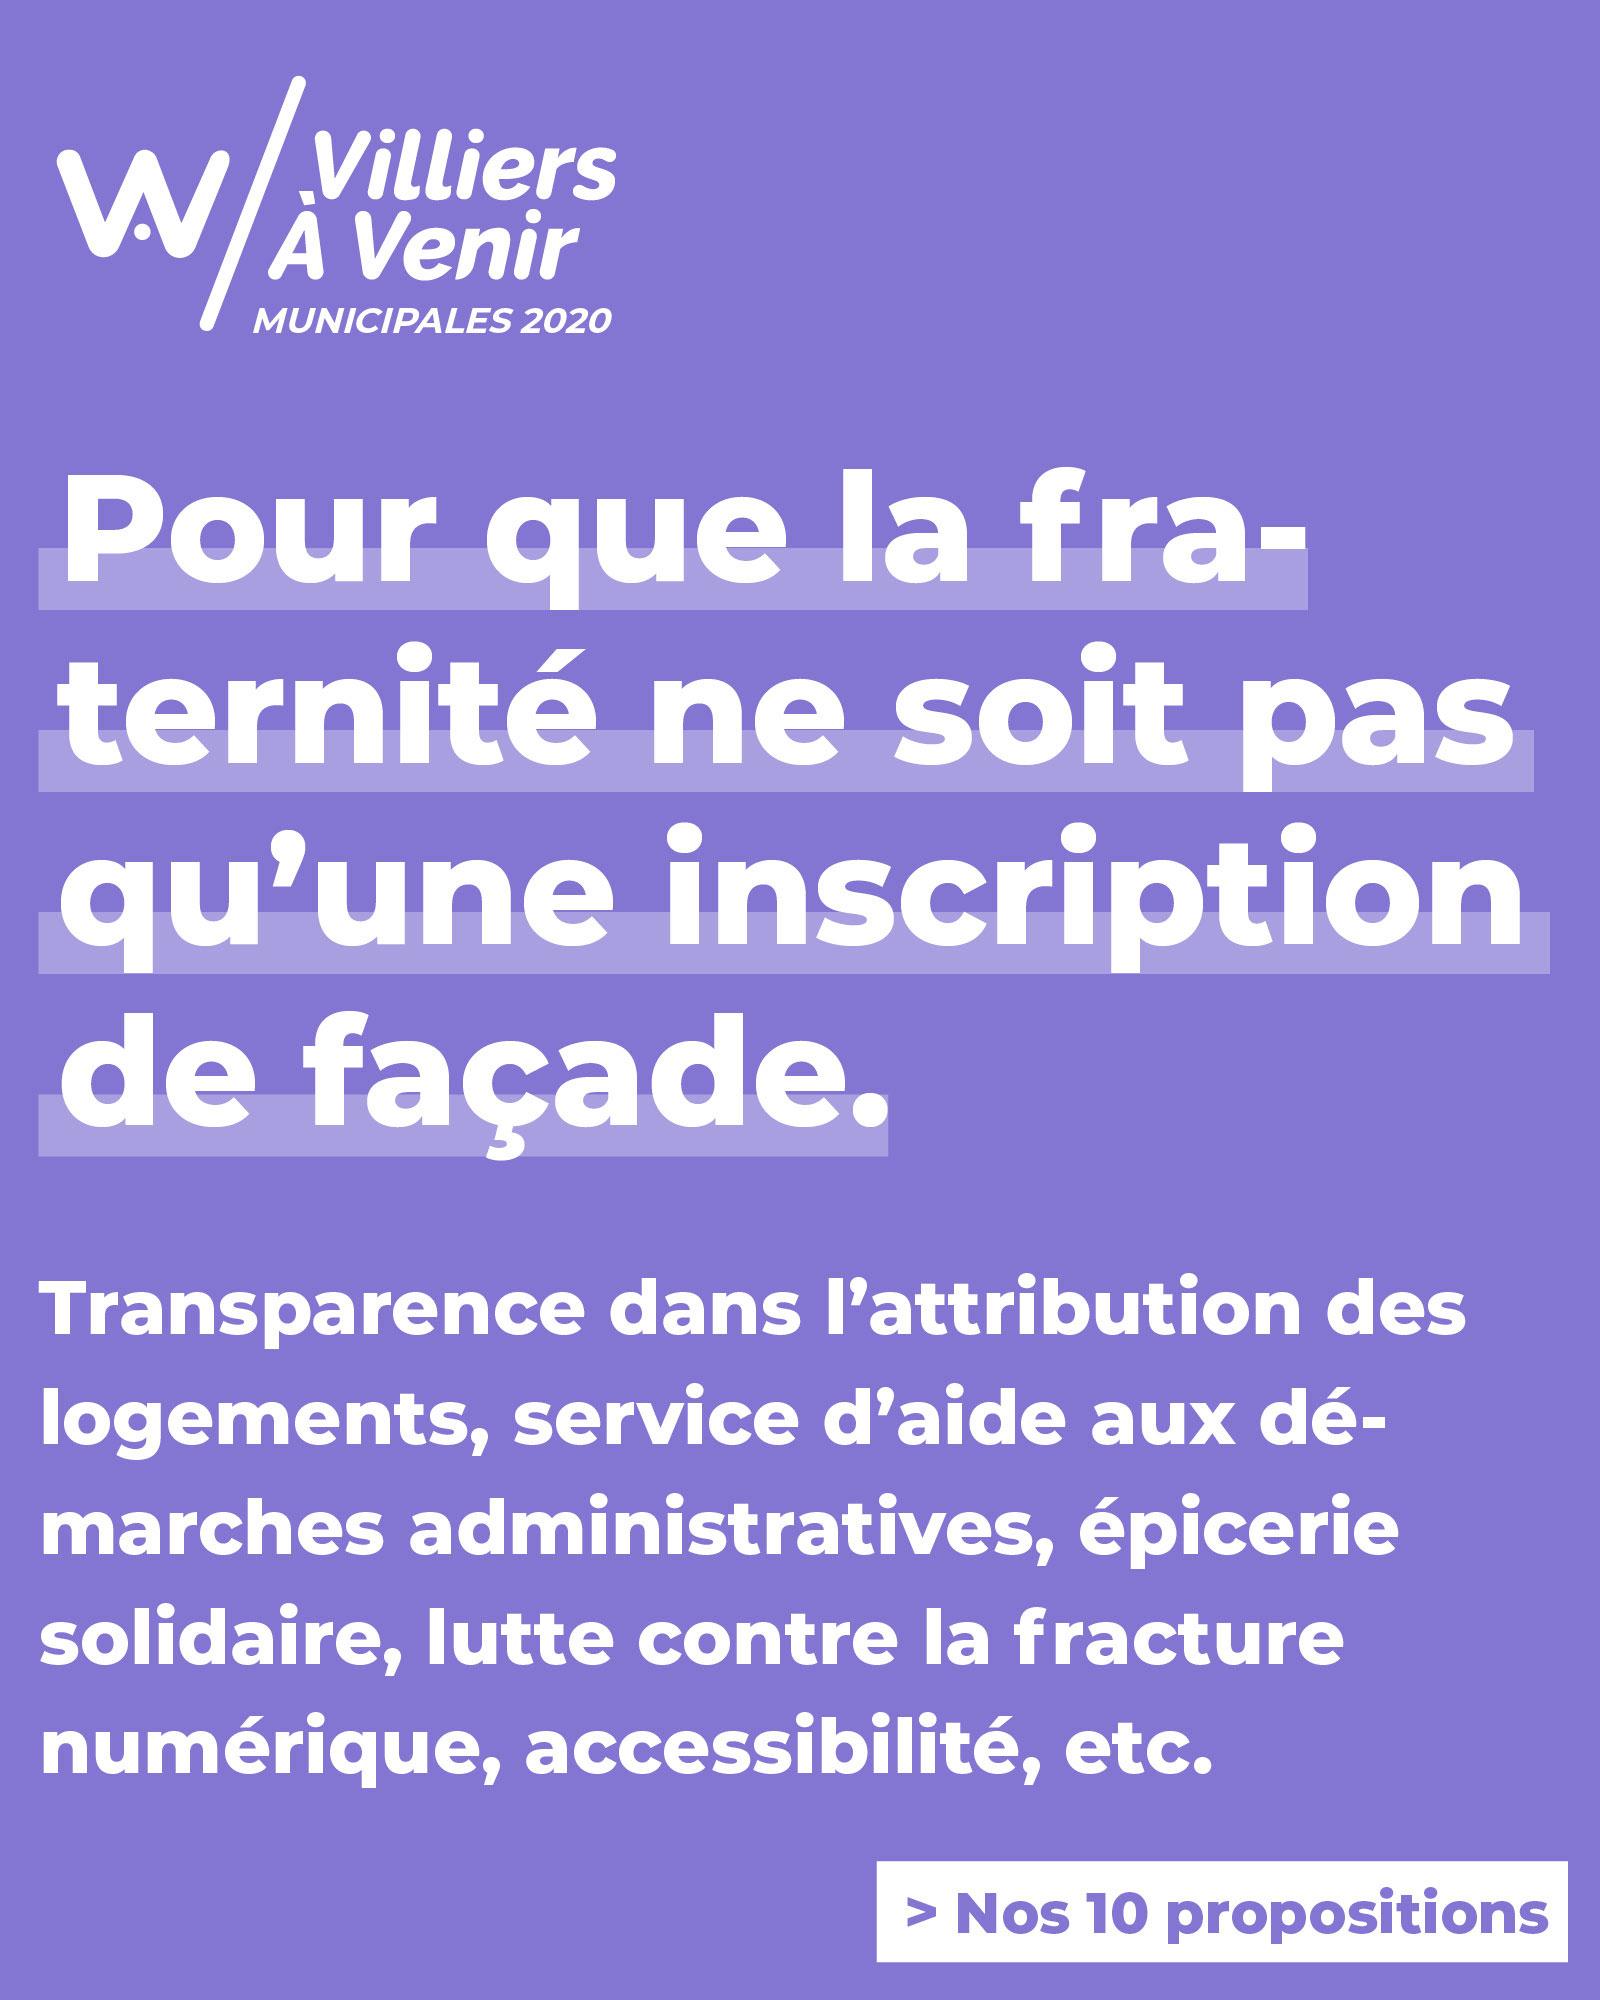 https://vav94.fr/wp-content/uploads/2020/02/SOLIDARITE-FRATERNITE-MUNICIPALES-2020-VILLIERS-SUR-MARNE-VILLIERS-A-VENIR-2.jpg